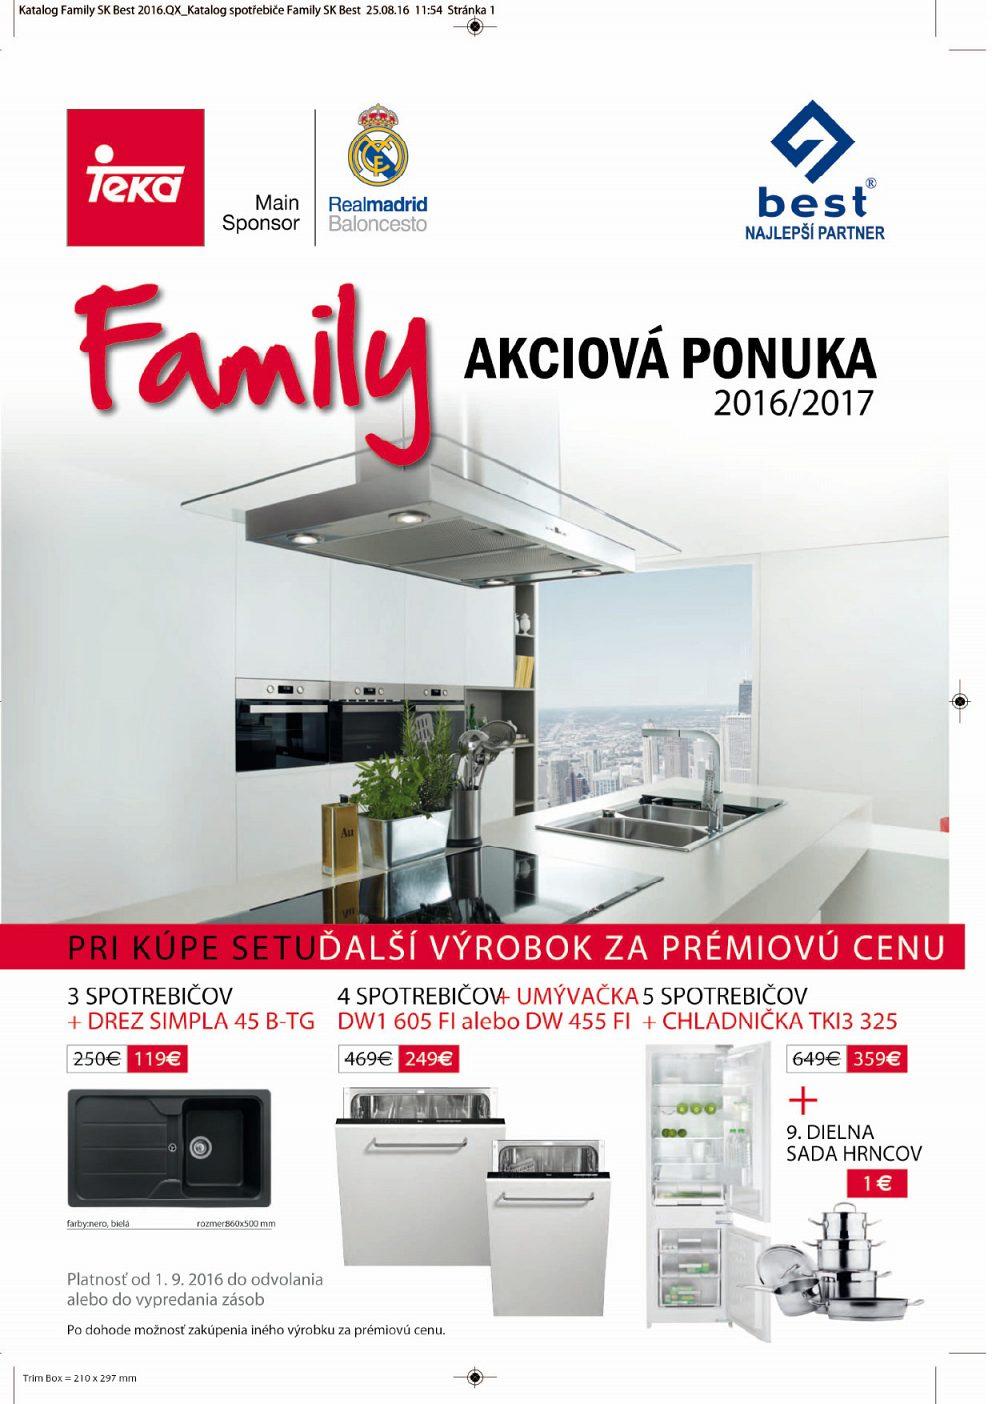 TEka - Family akciová ponuka 2016/2017